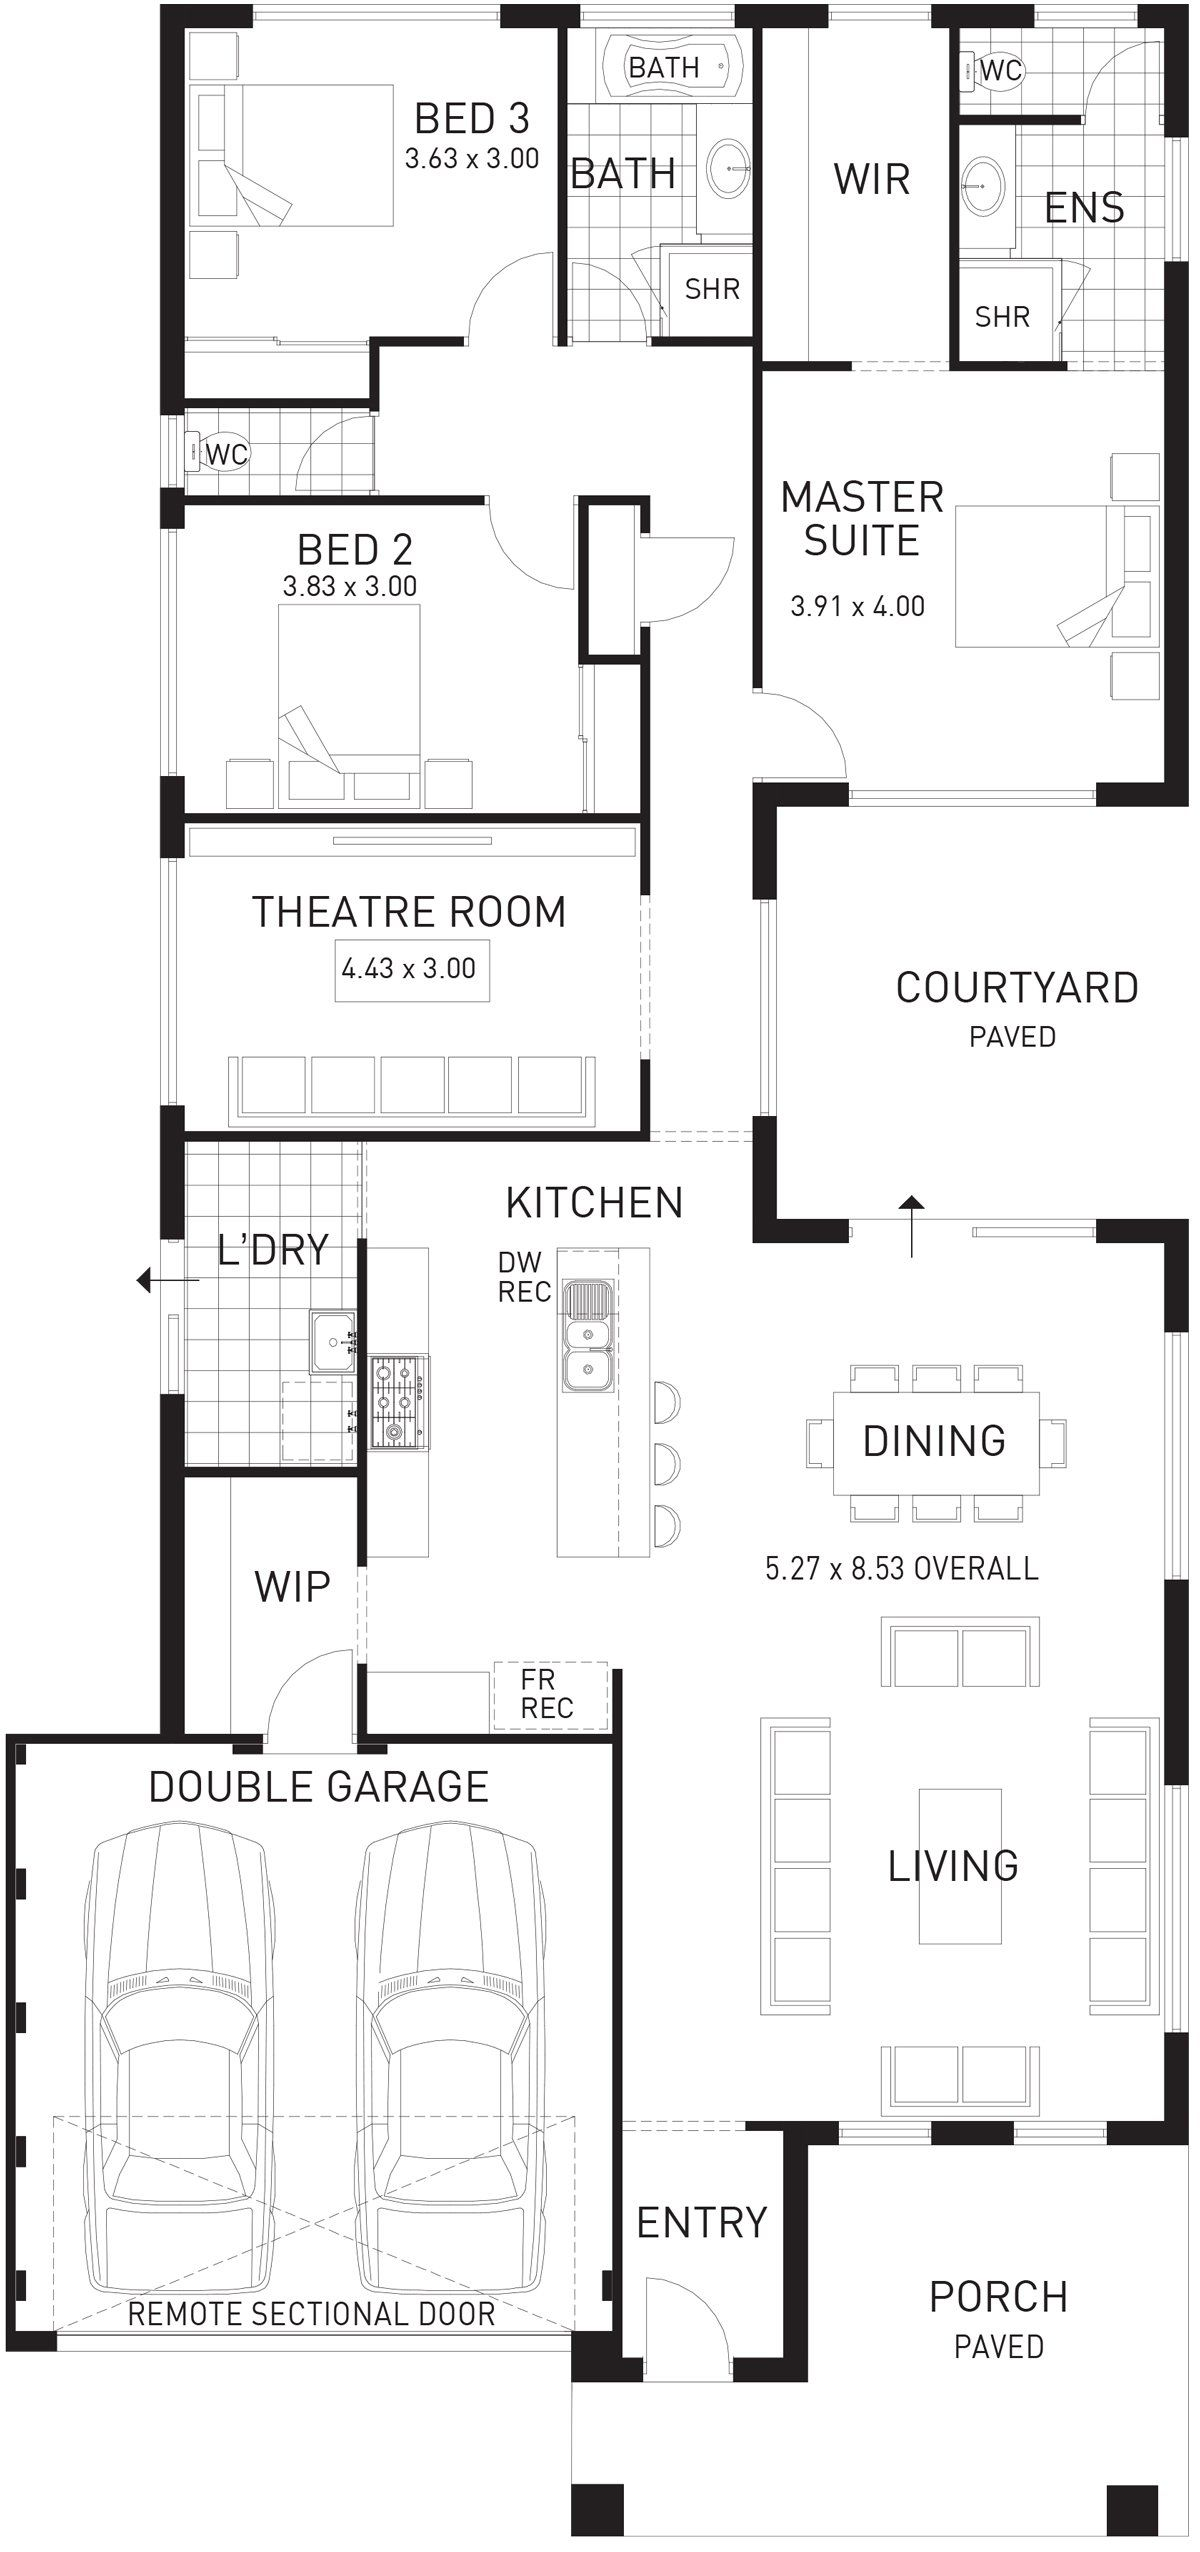 Cottesloe beach single storey home design foundation floor plan wa also rh pinterest